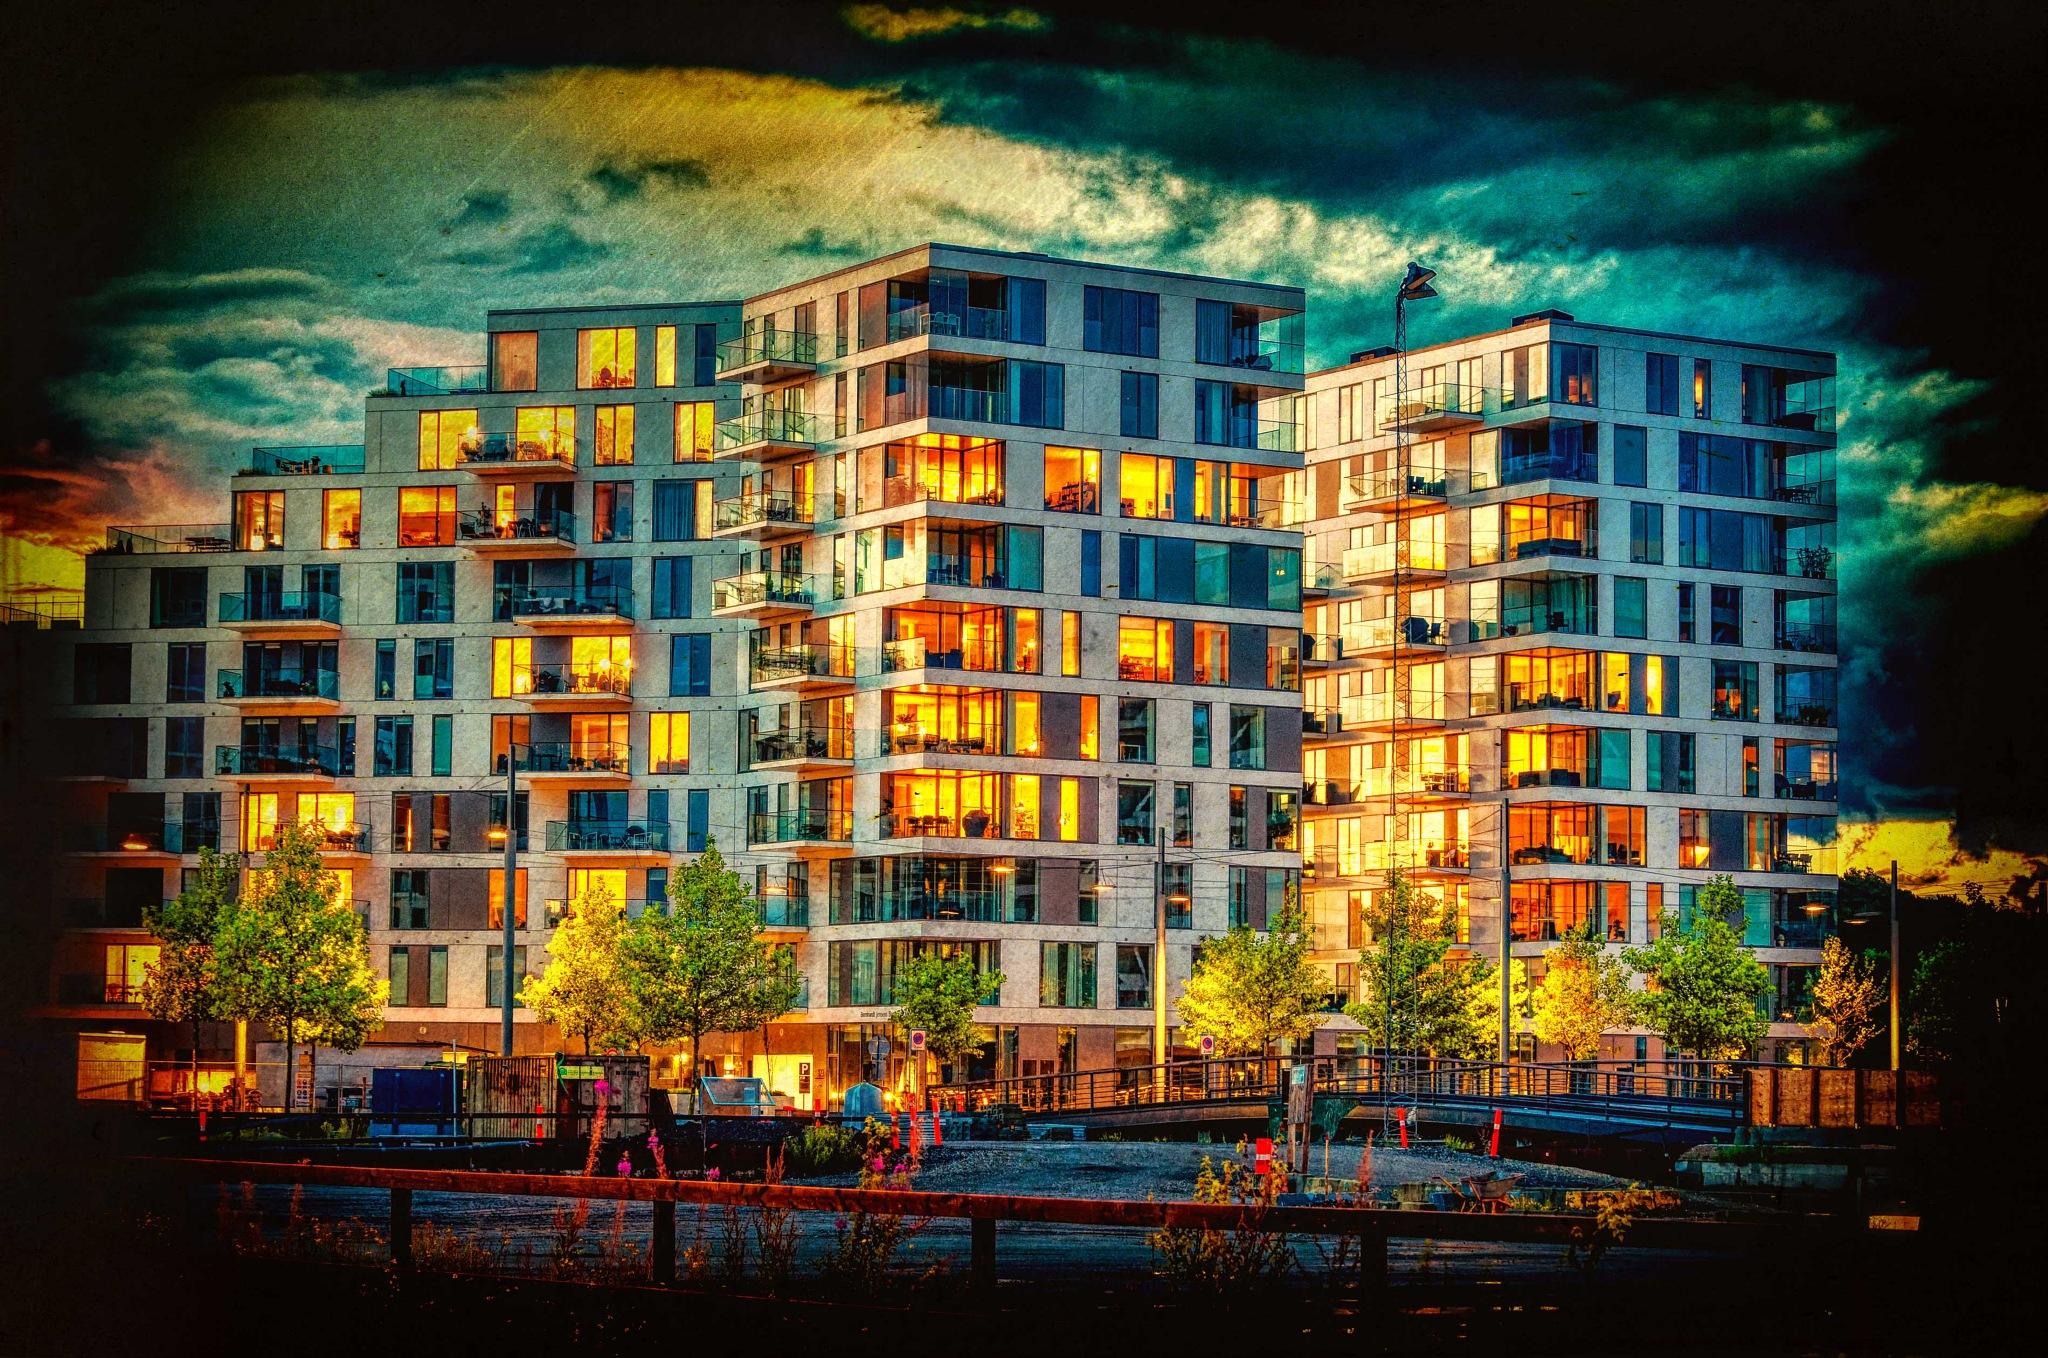 Cityscape by night by Preben Schmidt